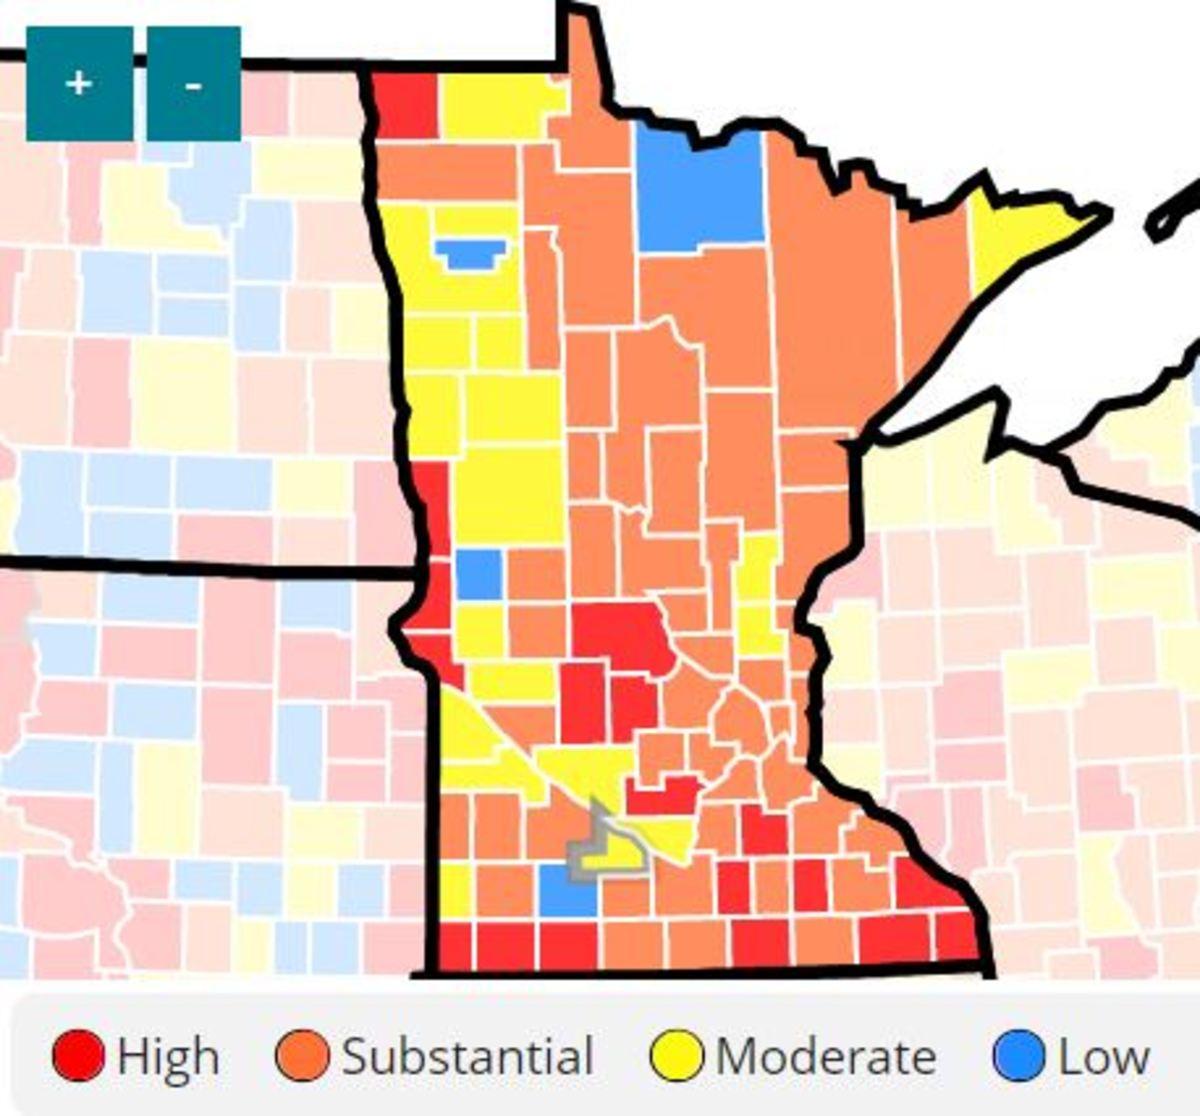 CDC Minnesota transmission mpa - Aug 5 2021